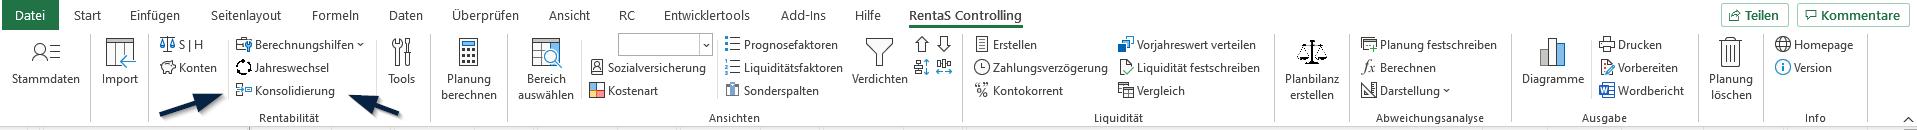 Konsolidierung_Menü_RentaS_Controllingsoftware